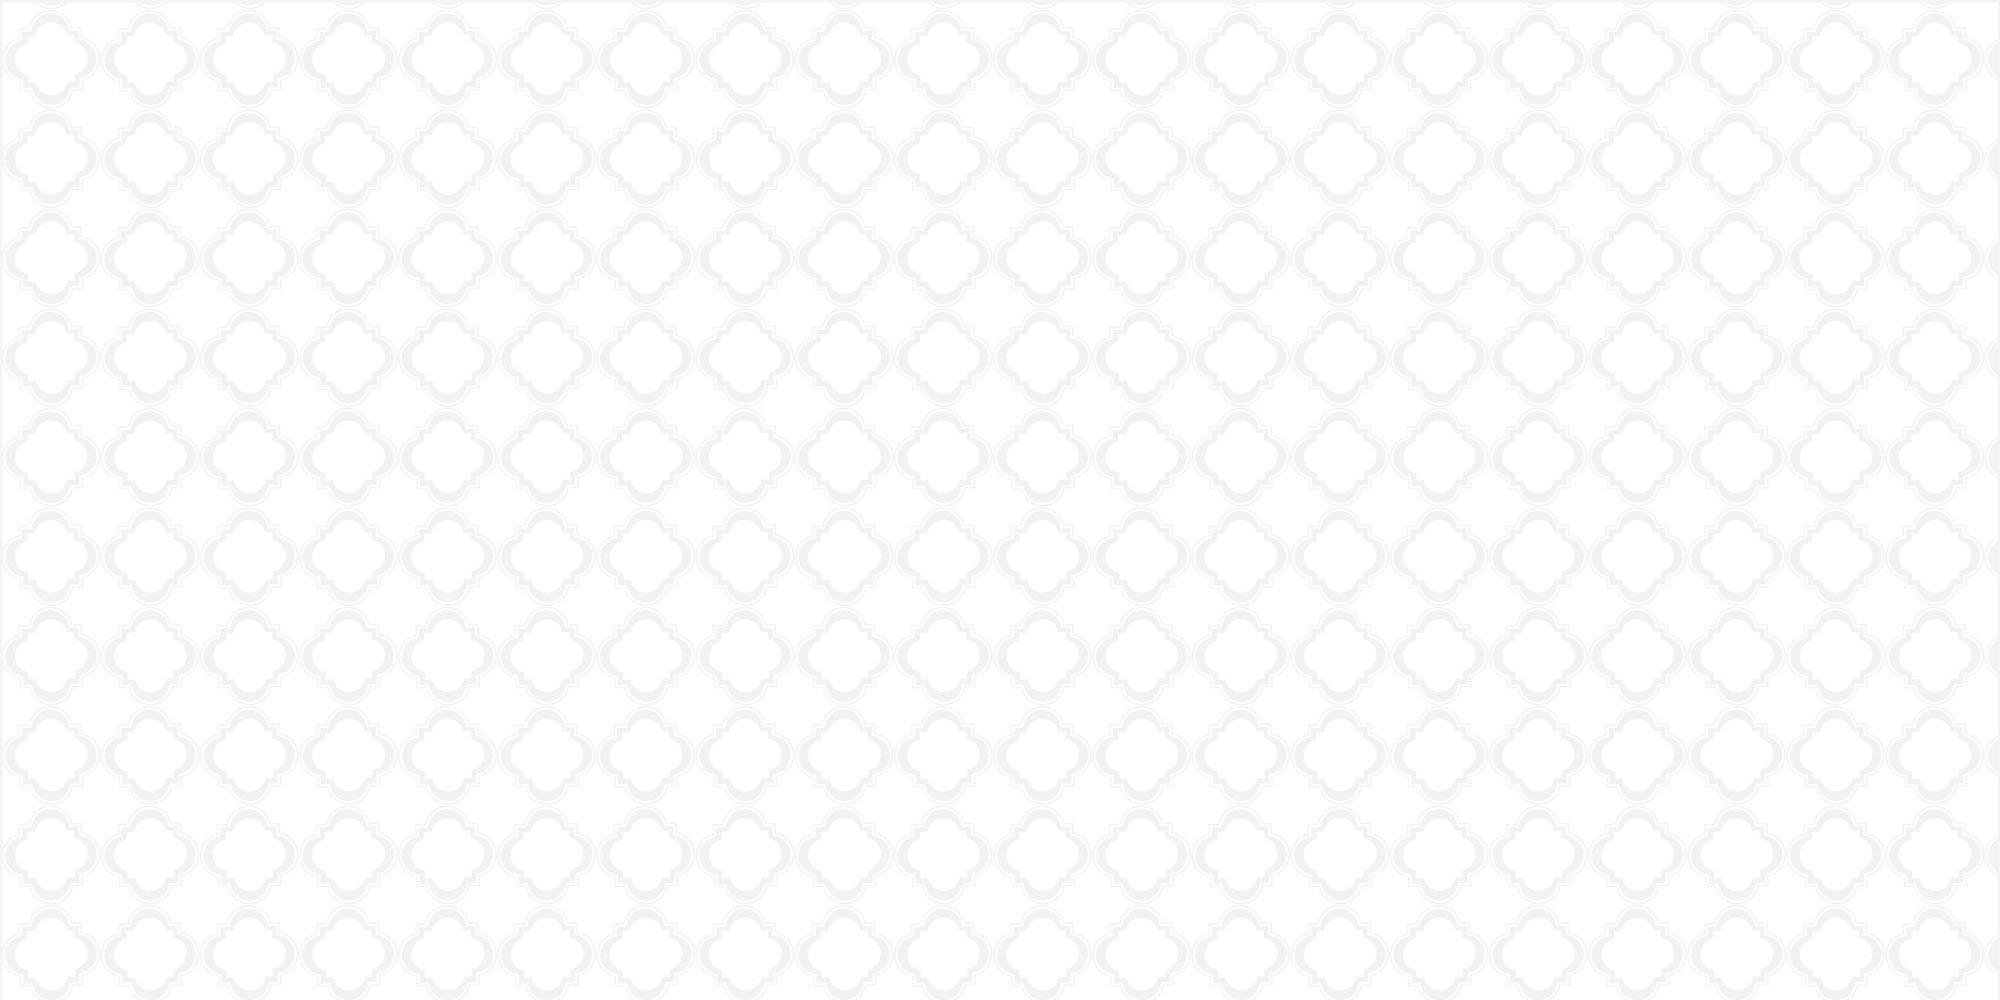 Transparent Tumblr Sidebar